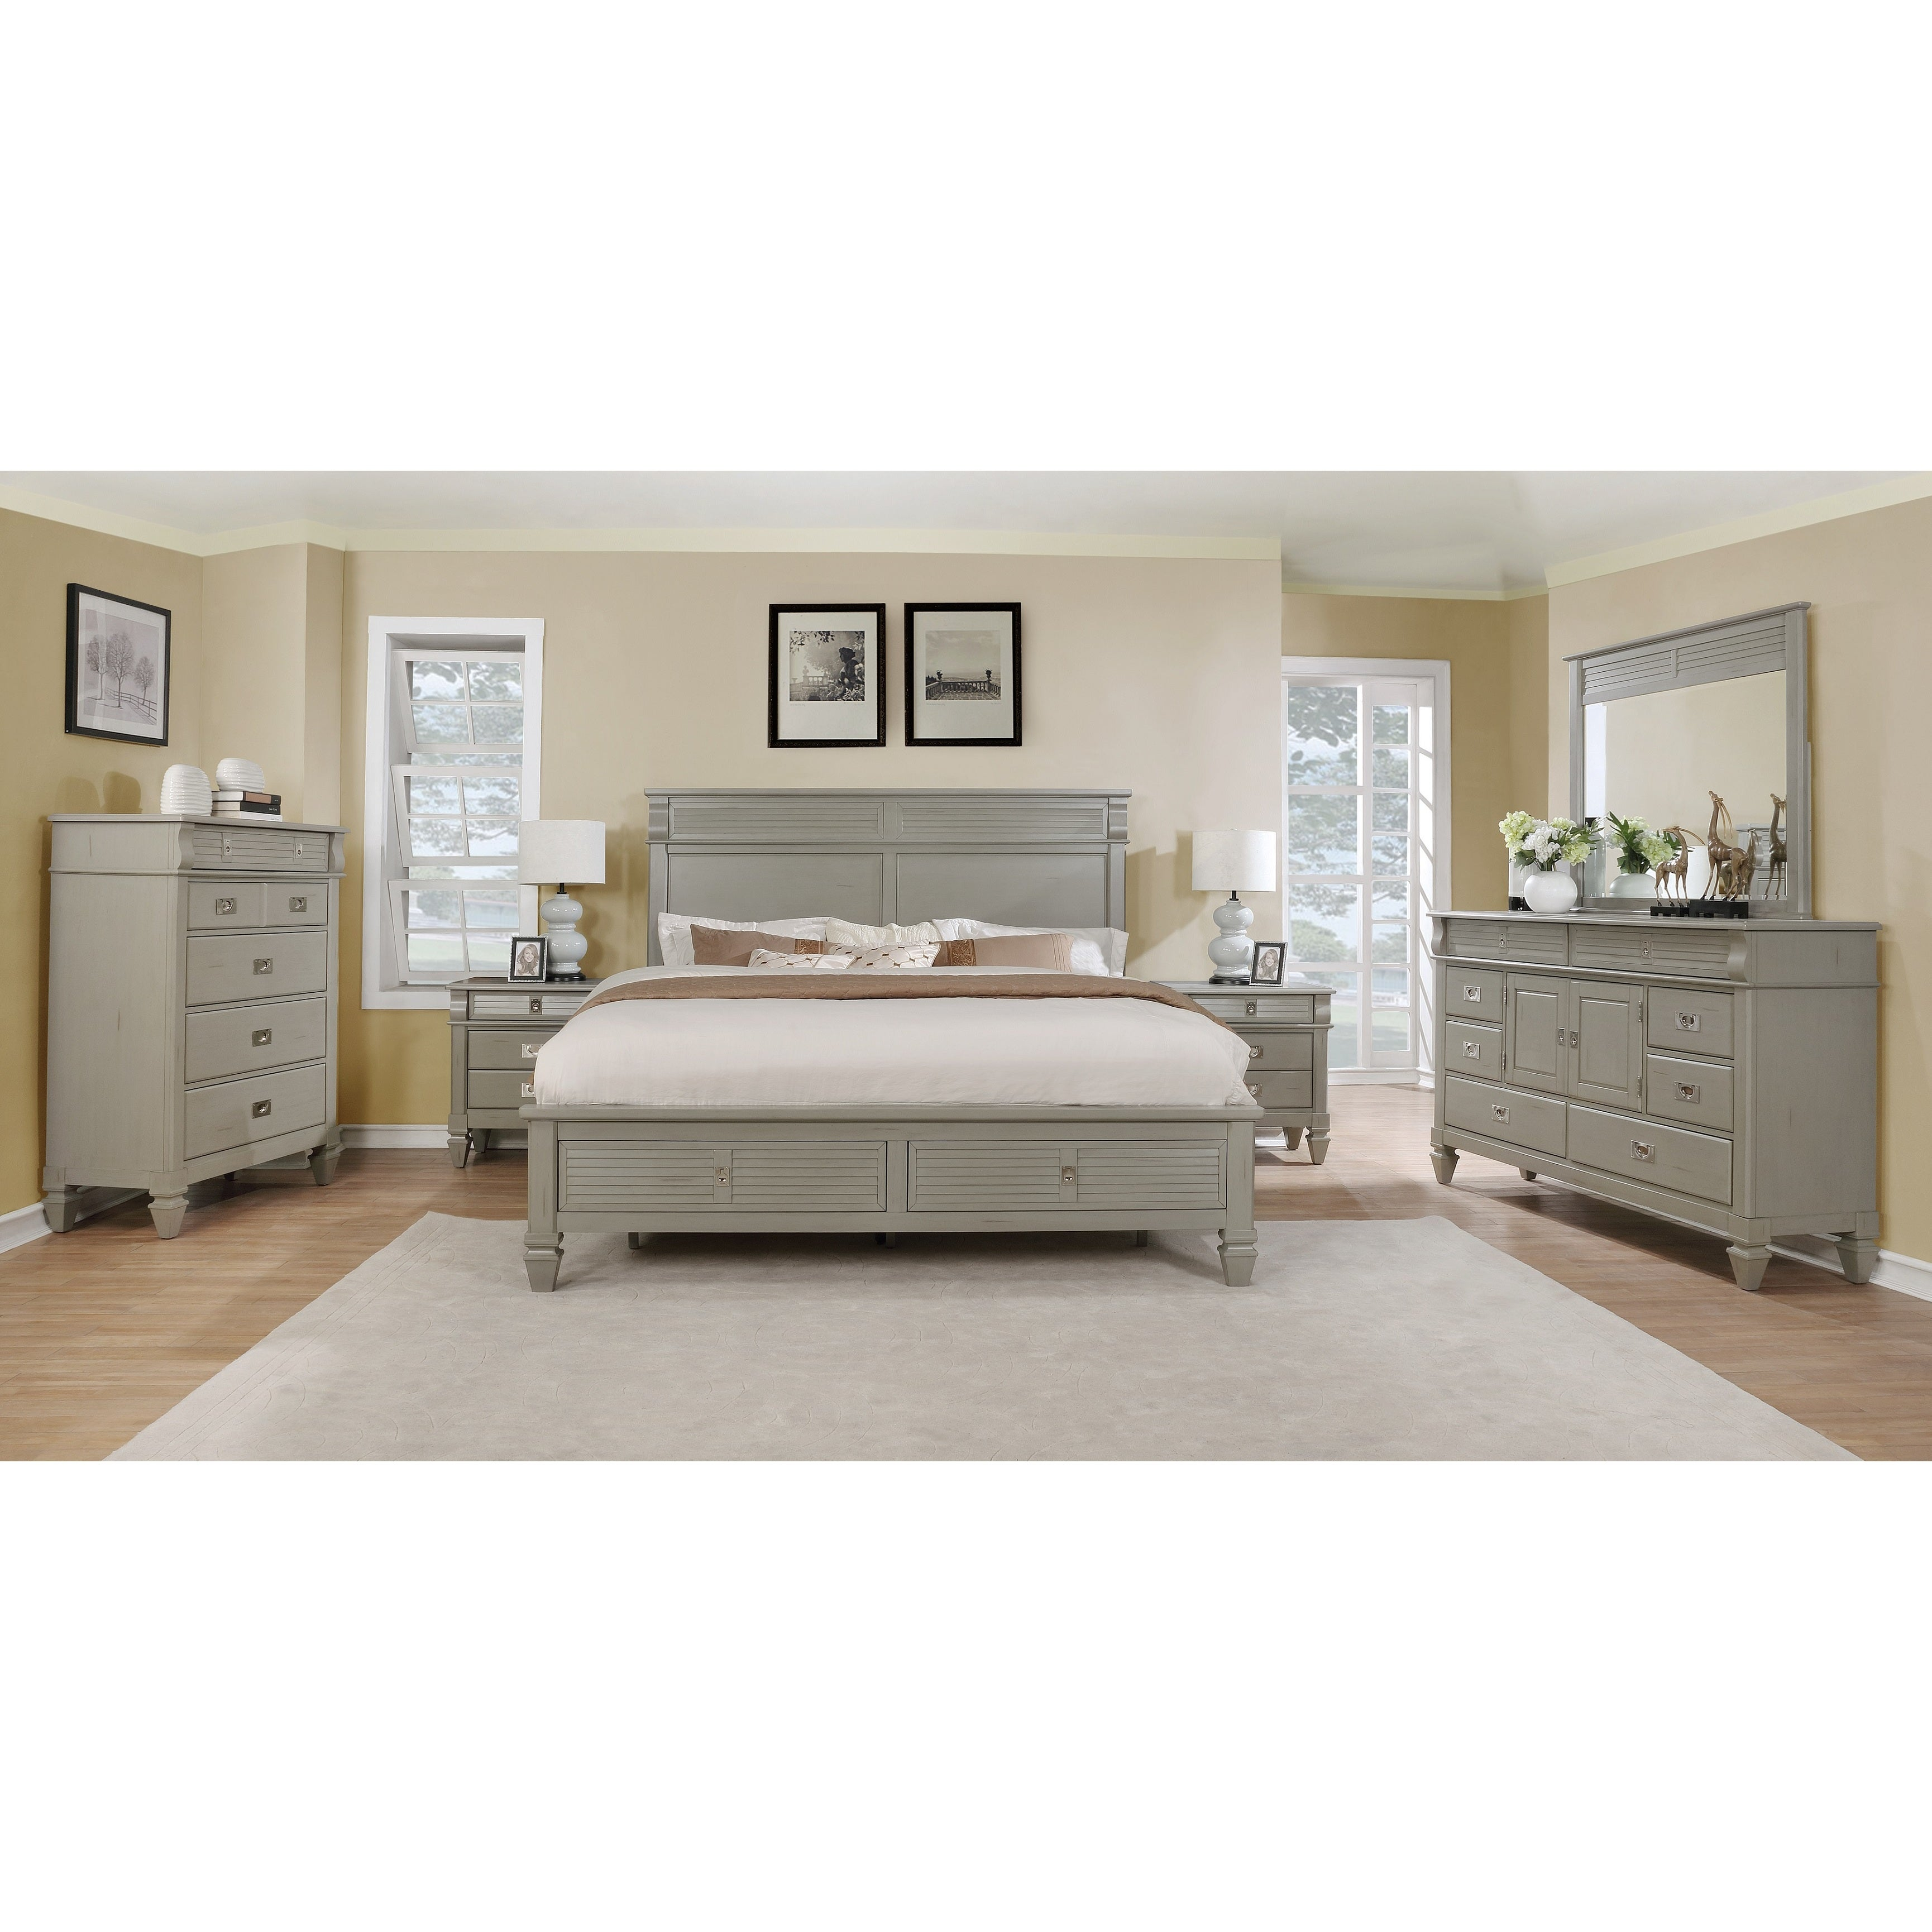 Distressed Bedroom Furniture | Find Great Furniture Deals Shopping ...